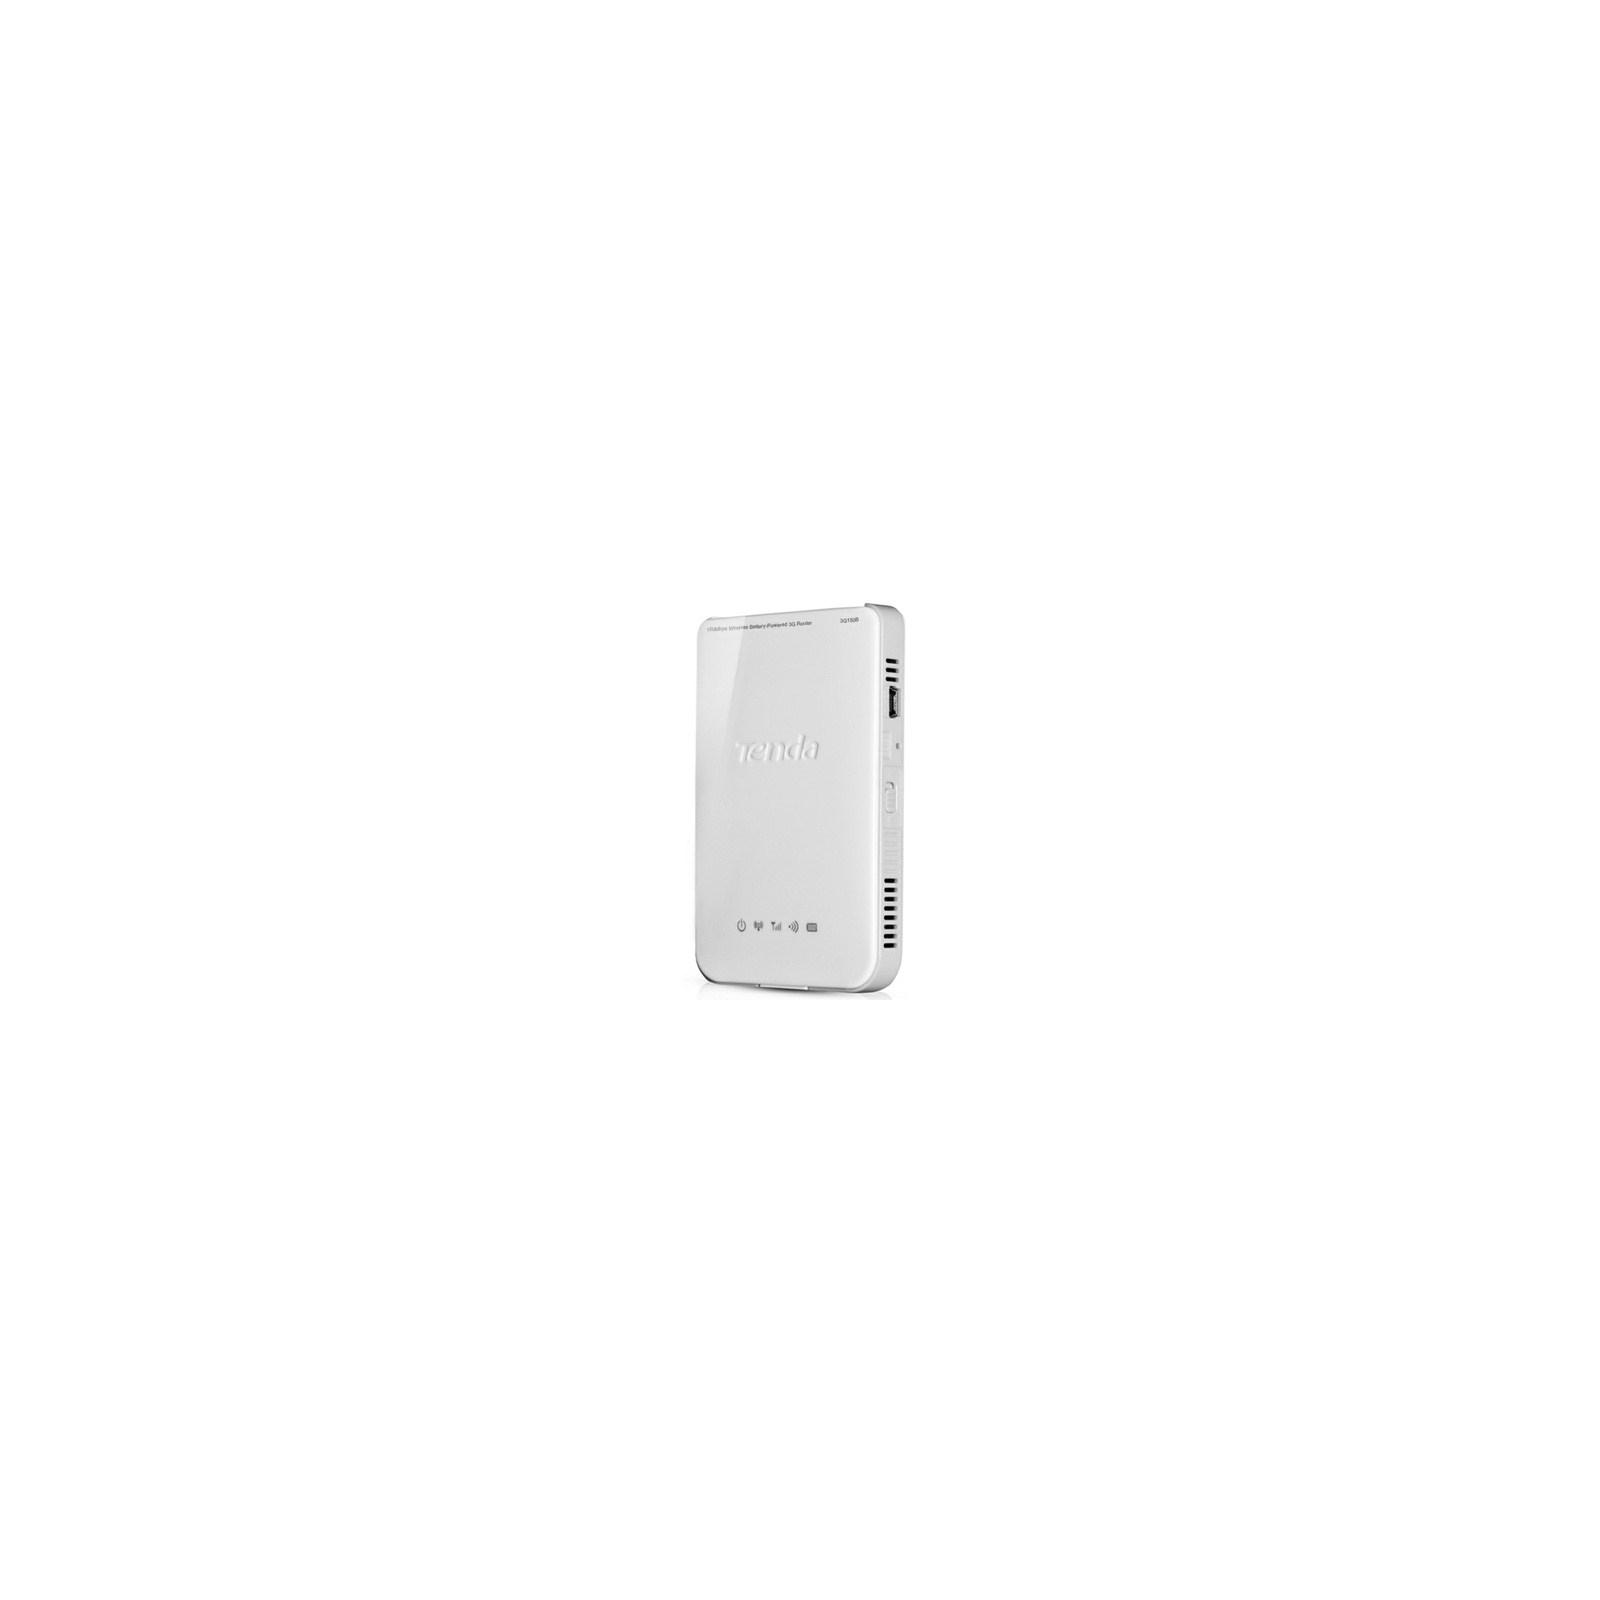 Маршрутизатор TENDA 3G150B